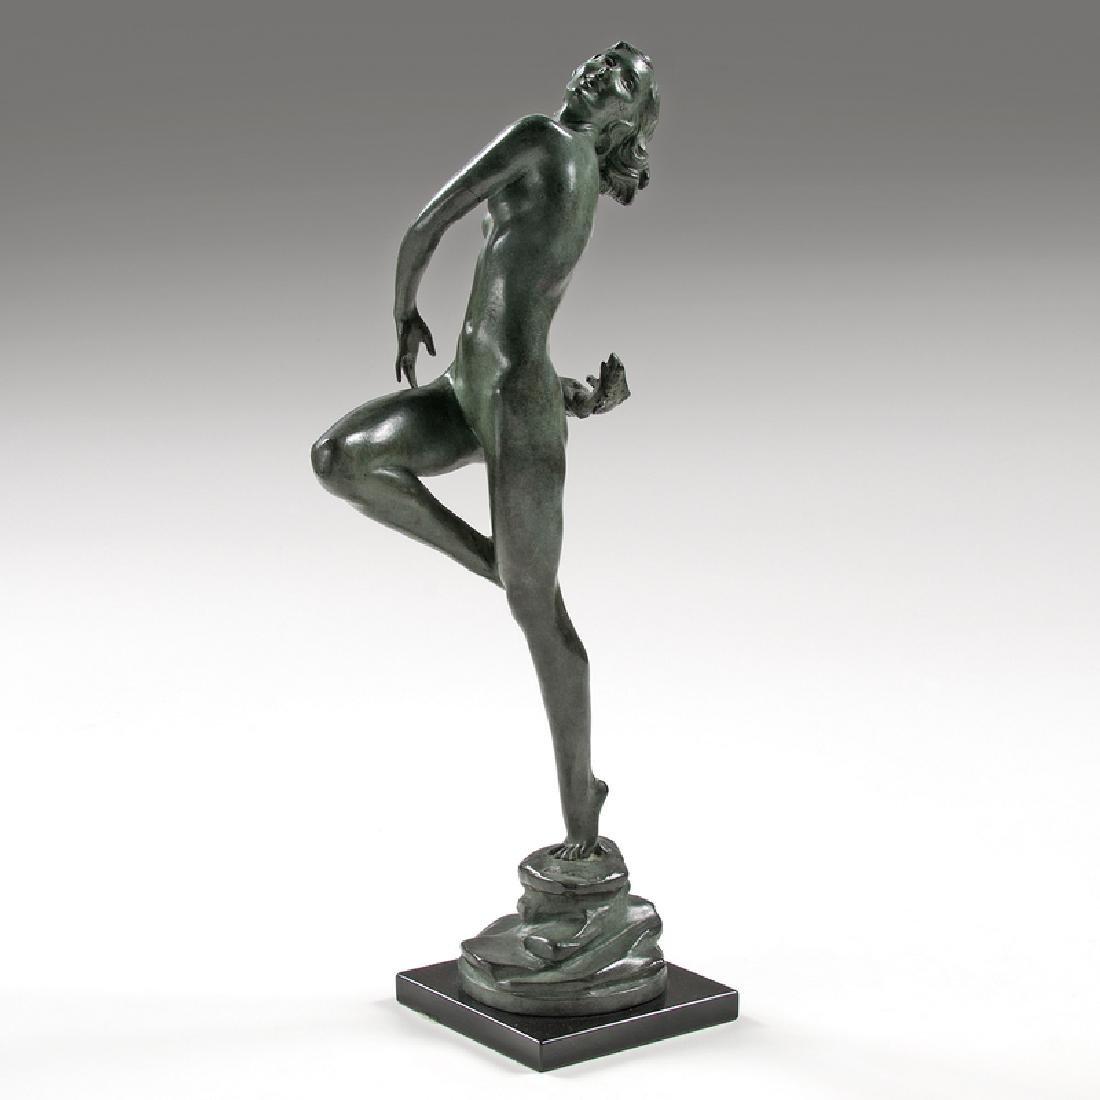 Harriet Whitney Frishmuth (American, 1880-1980) Bronze